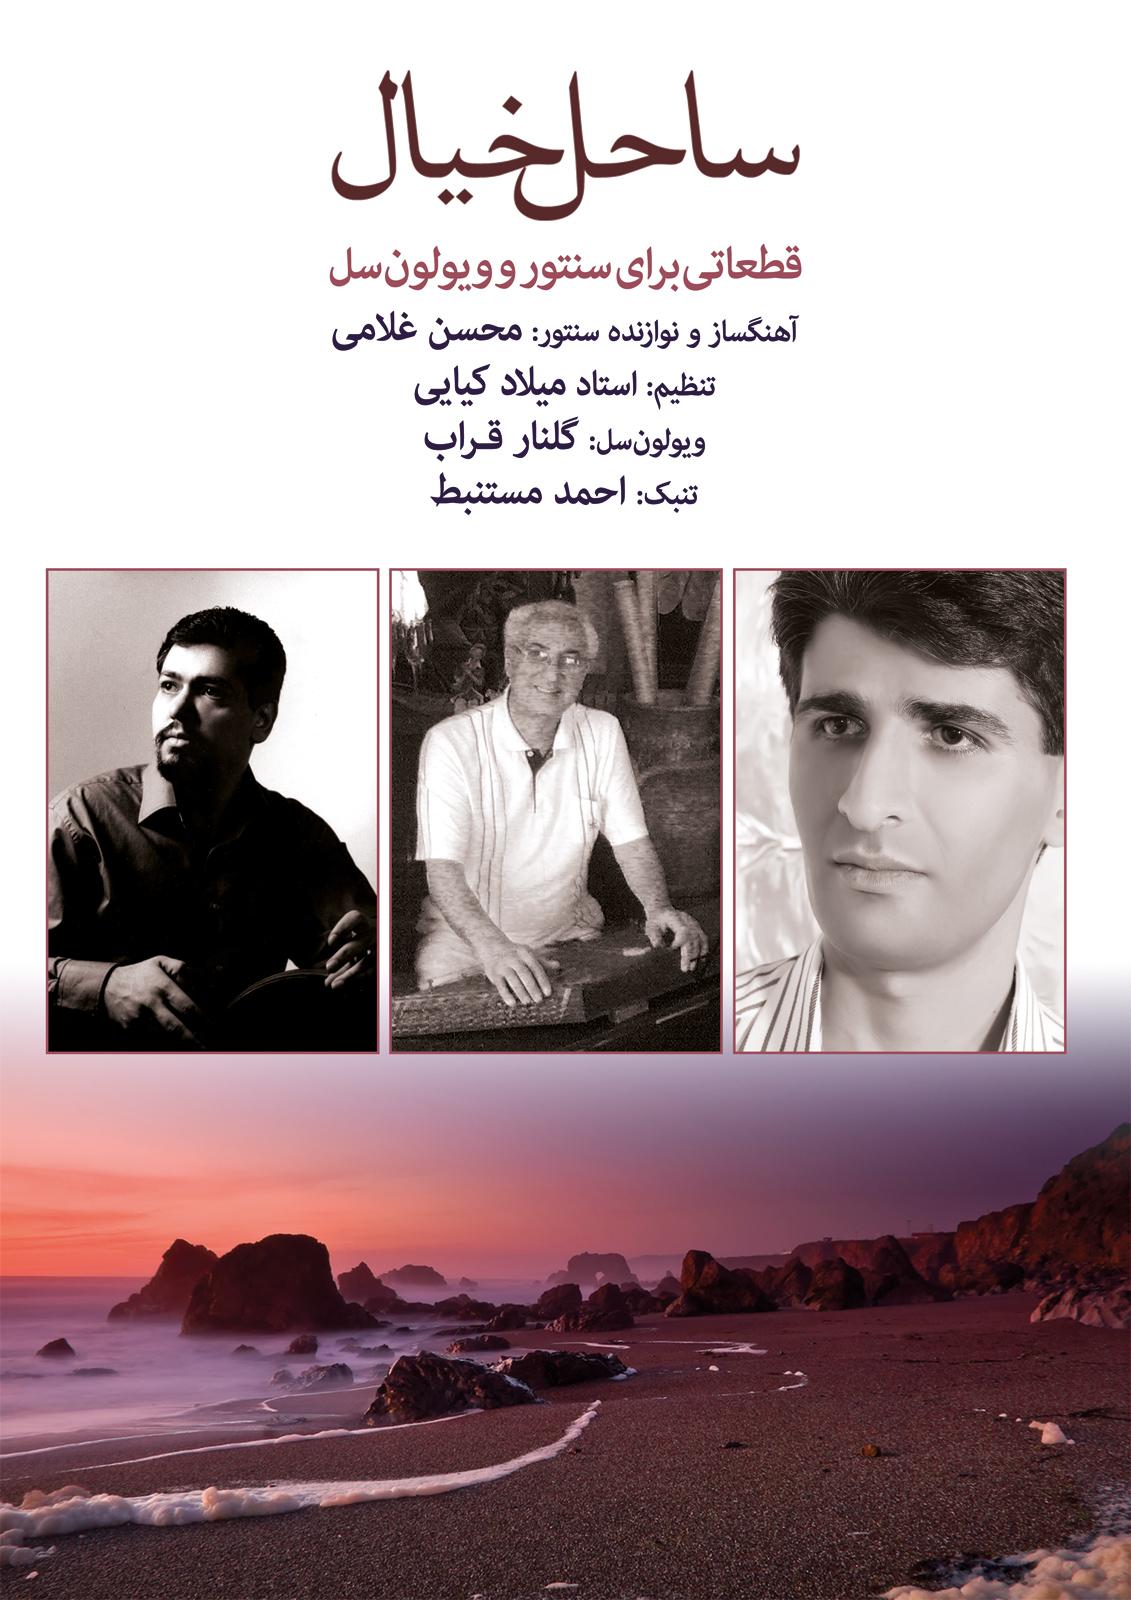 آواز اوج .آلبوم ساحل خیال محسن غلامی